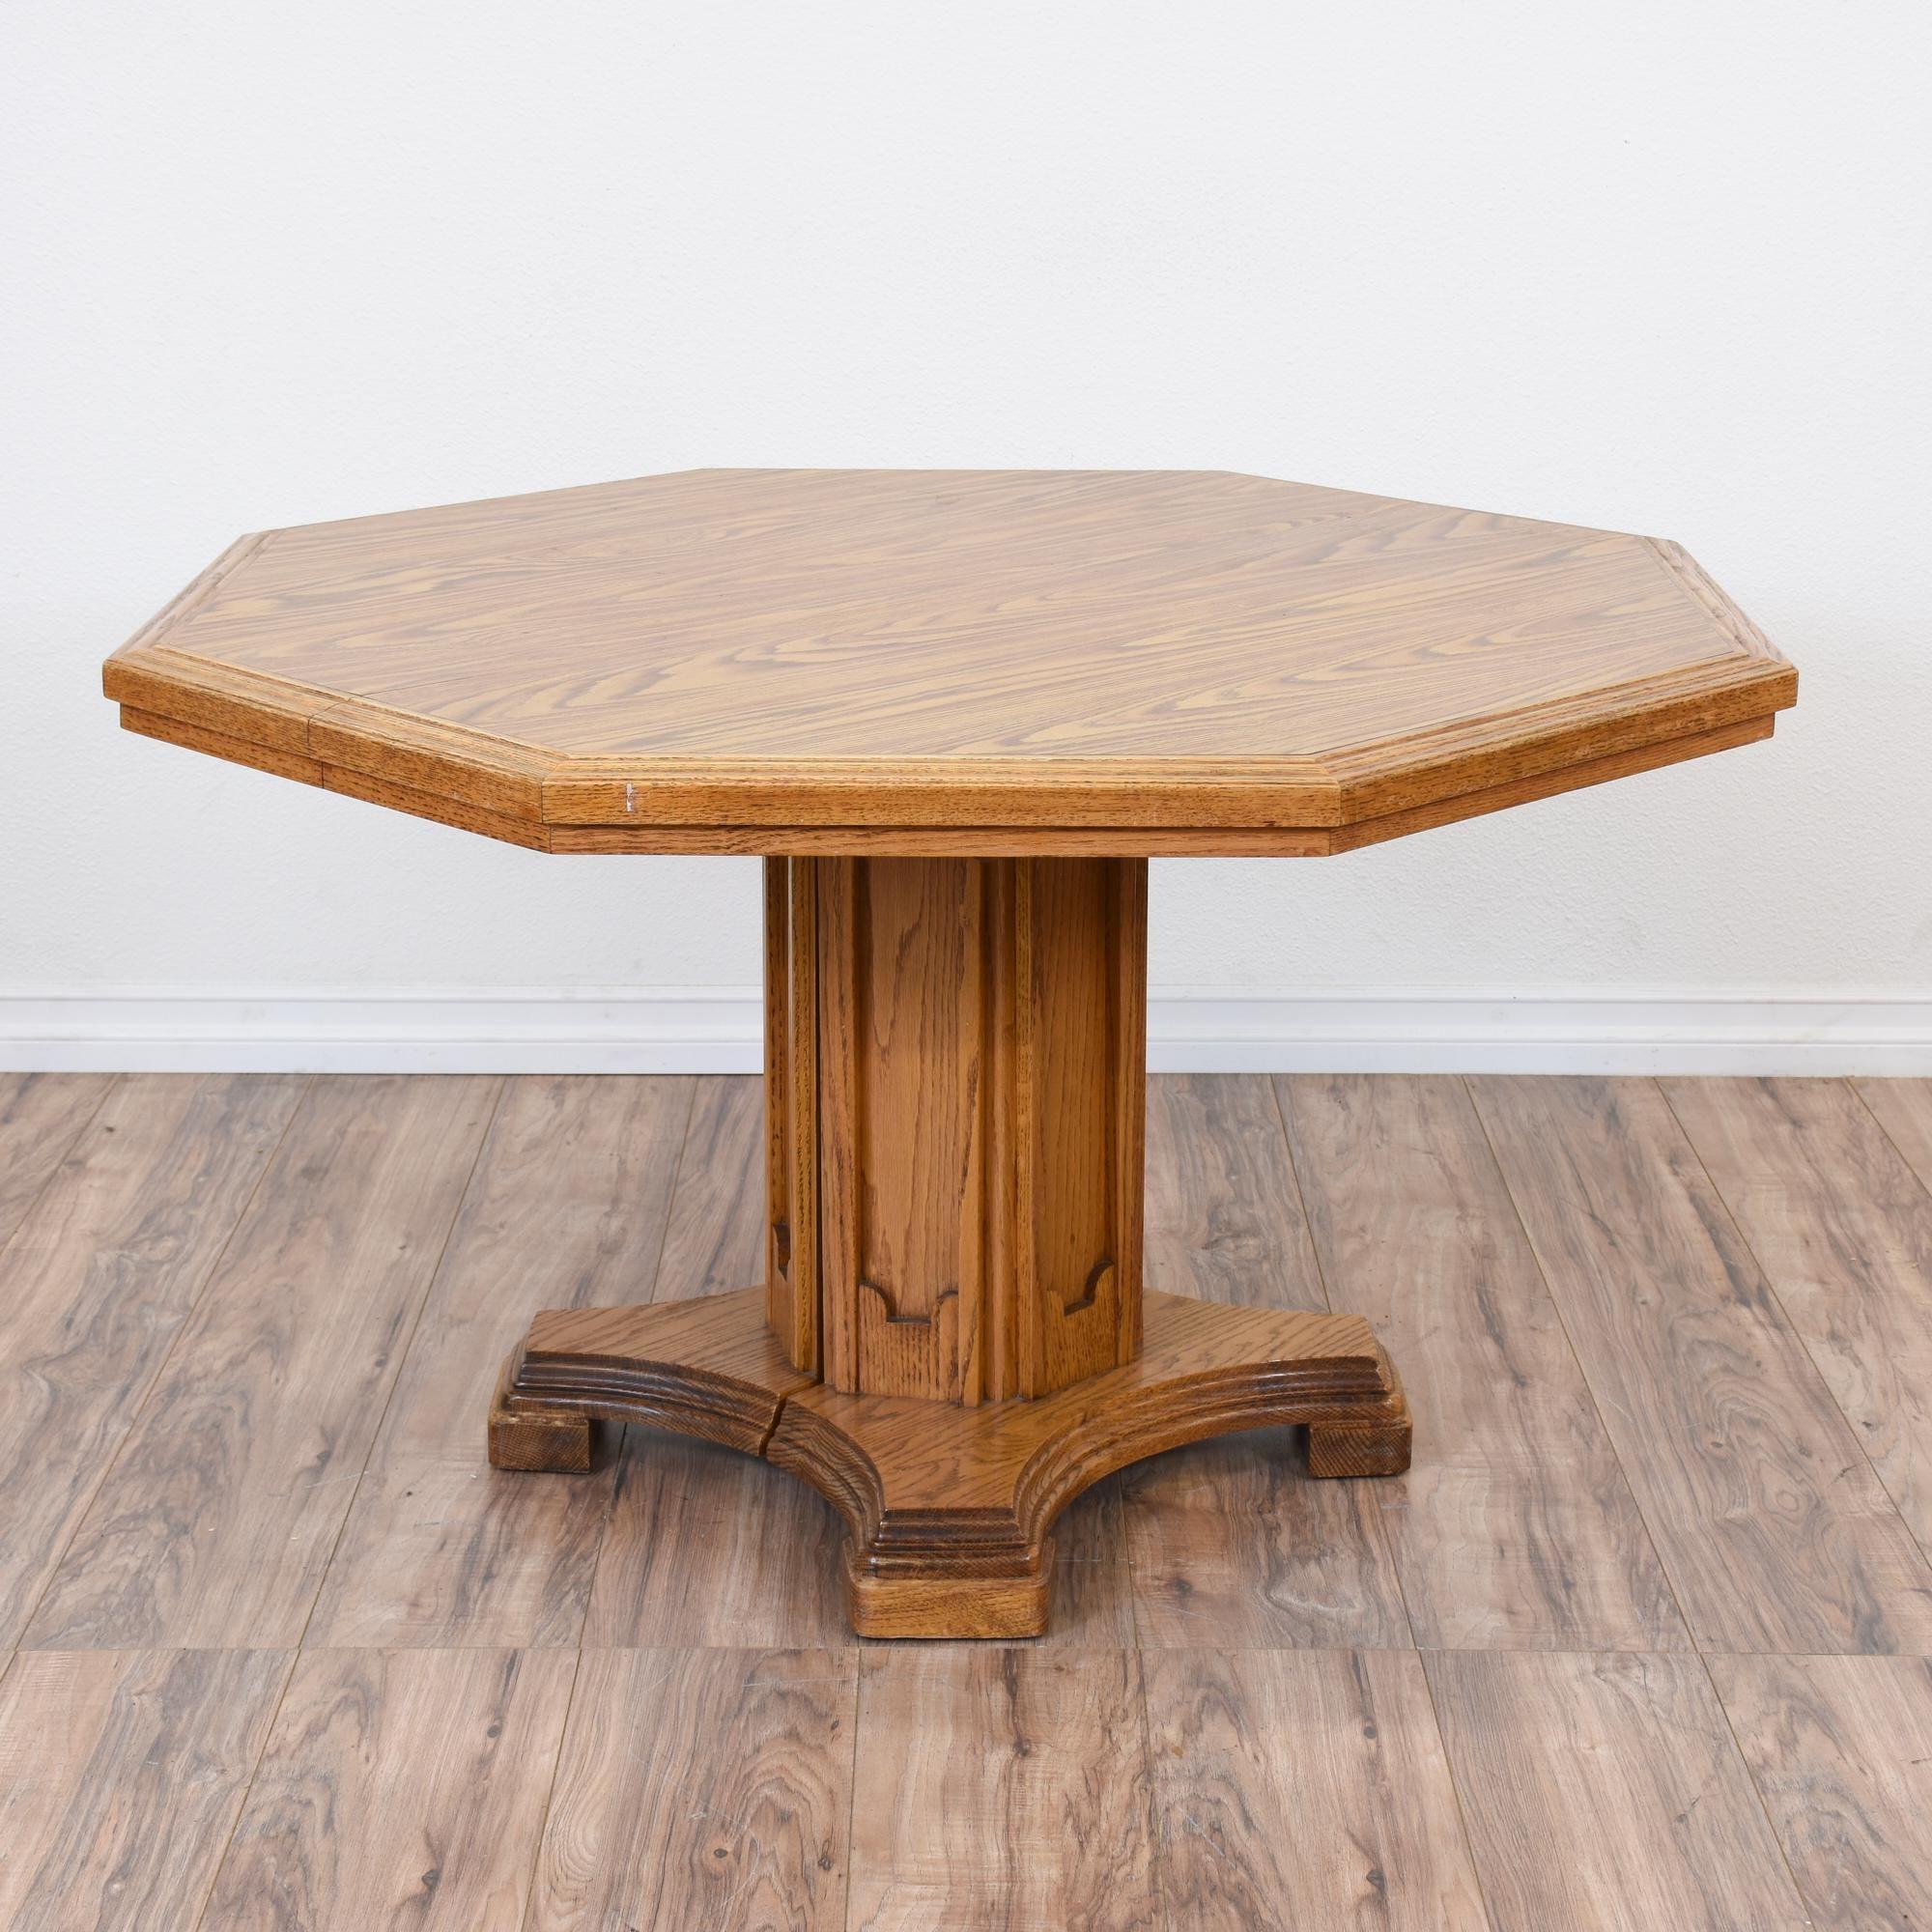 Carved Honey Oak Octagon Pedestal Dining Table Octagon table : f3b57ef314190ed1e911d25733728669 from www.pinterest.com size 2000 x 2000 jpeg 414kB